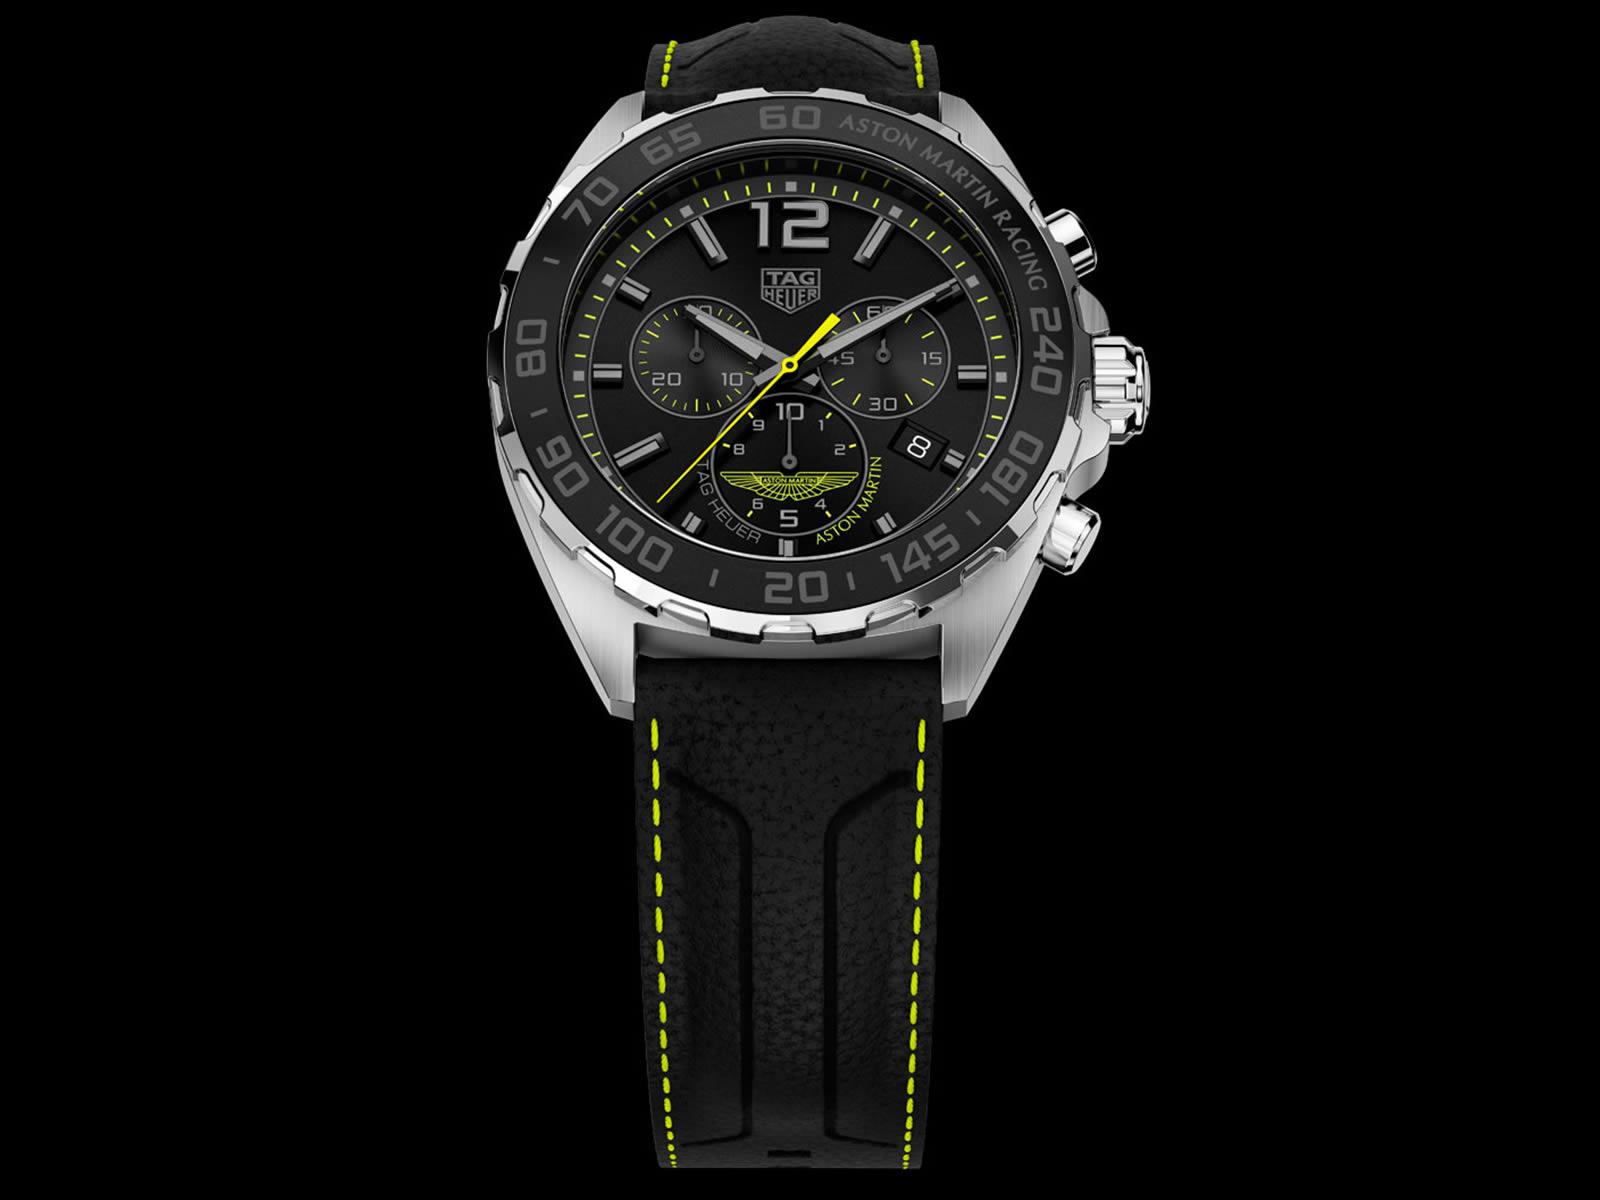 caz101p-fc8245-tag-heuer-formula-1-chronograph-1-.jpg